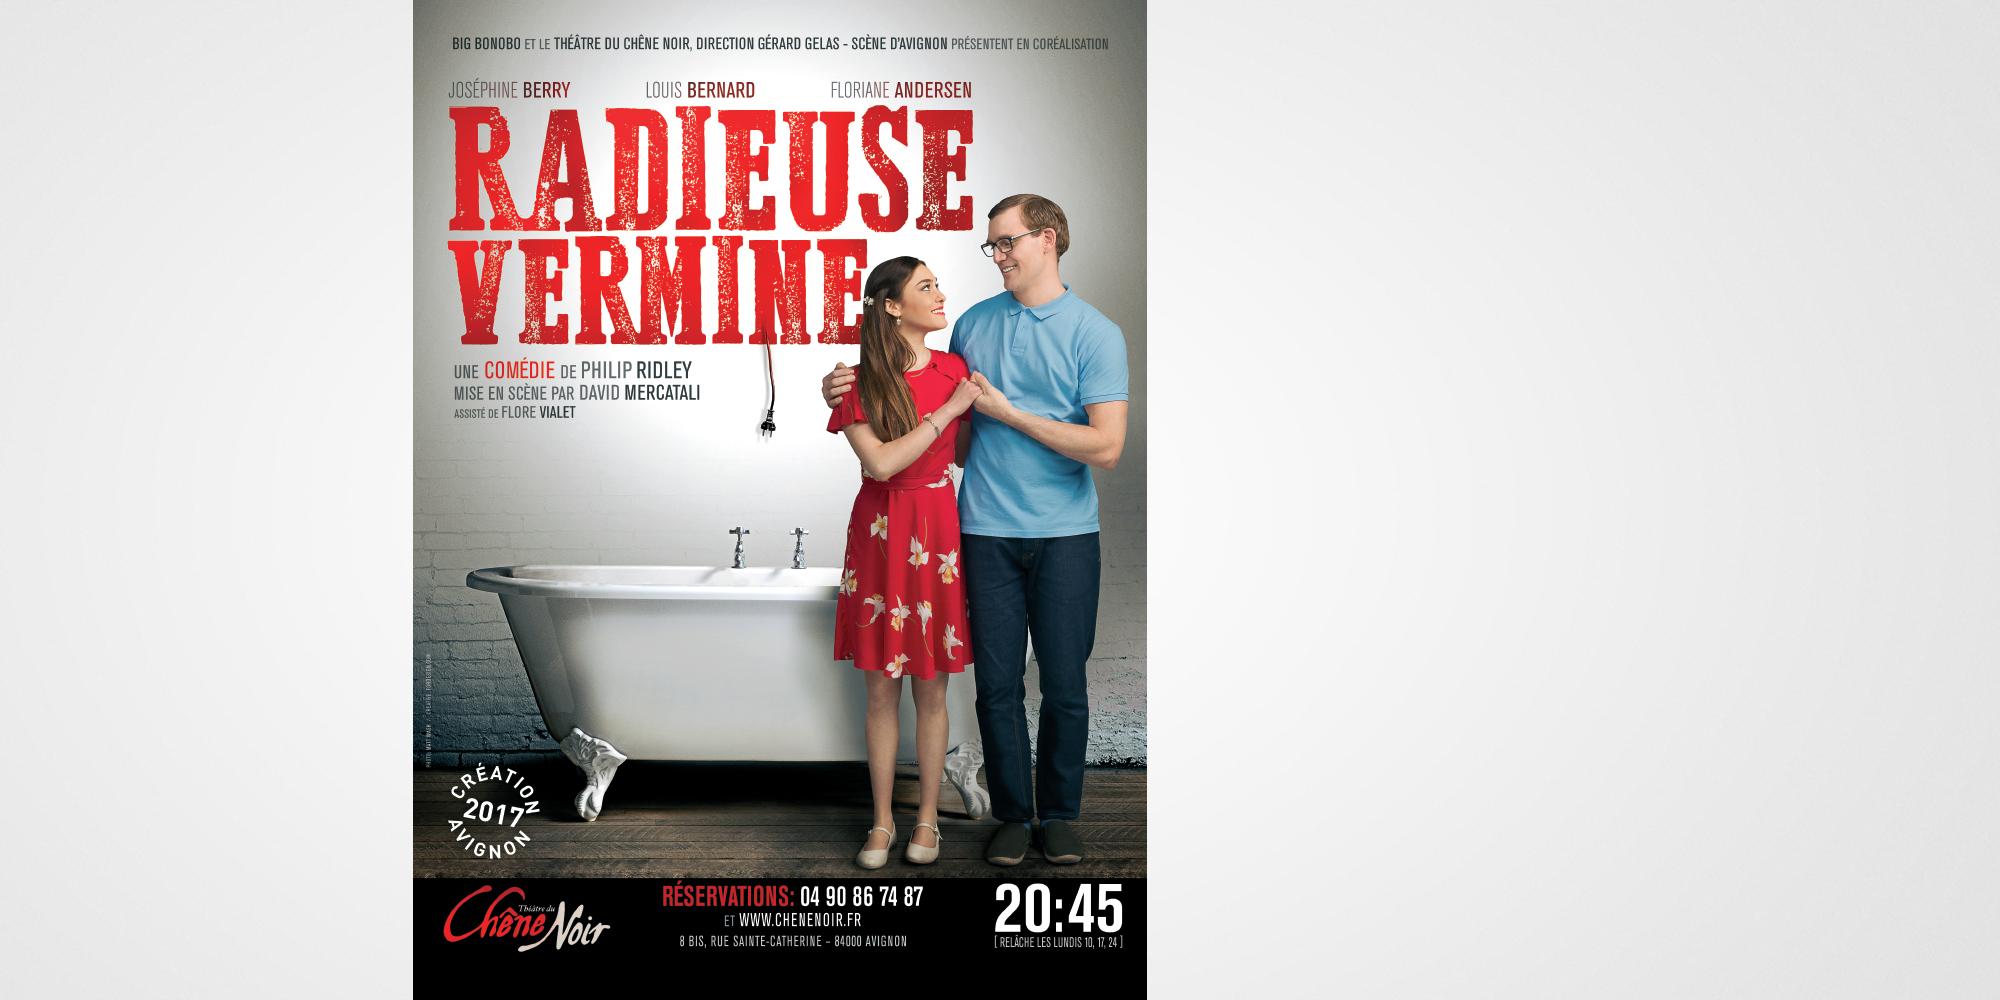 RADIEUSE VERMINE / FORDESIGN